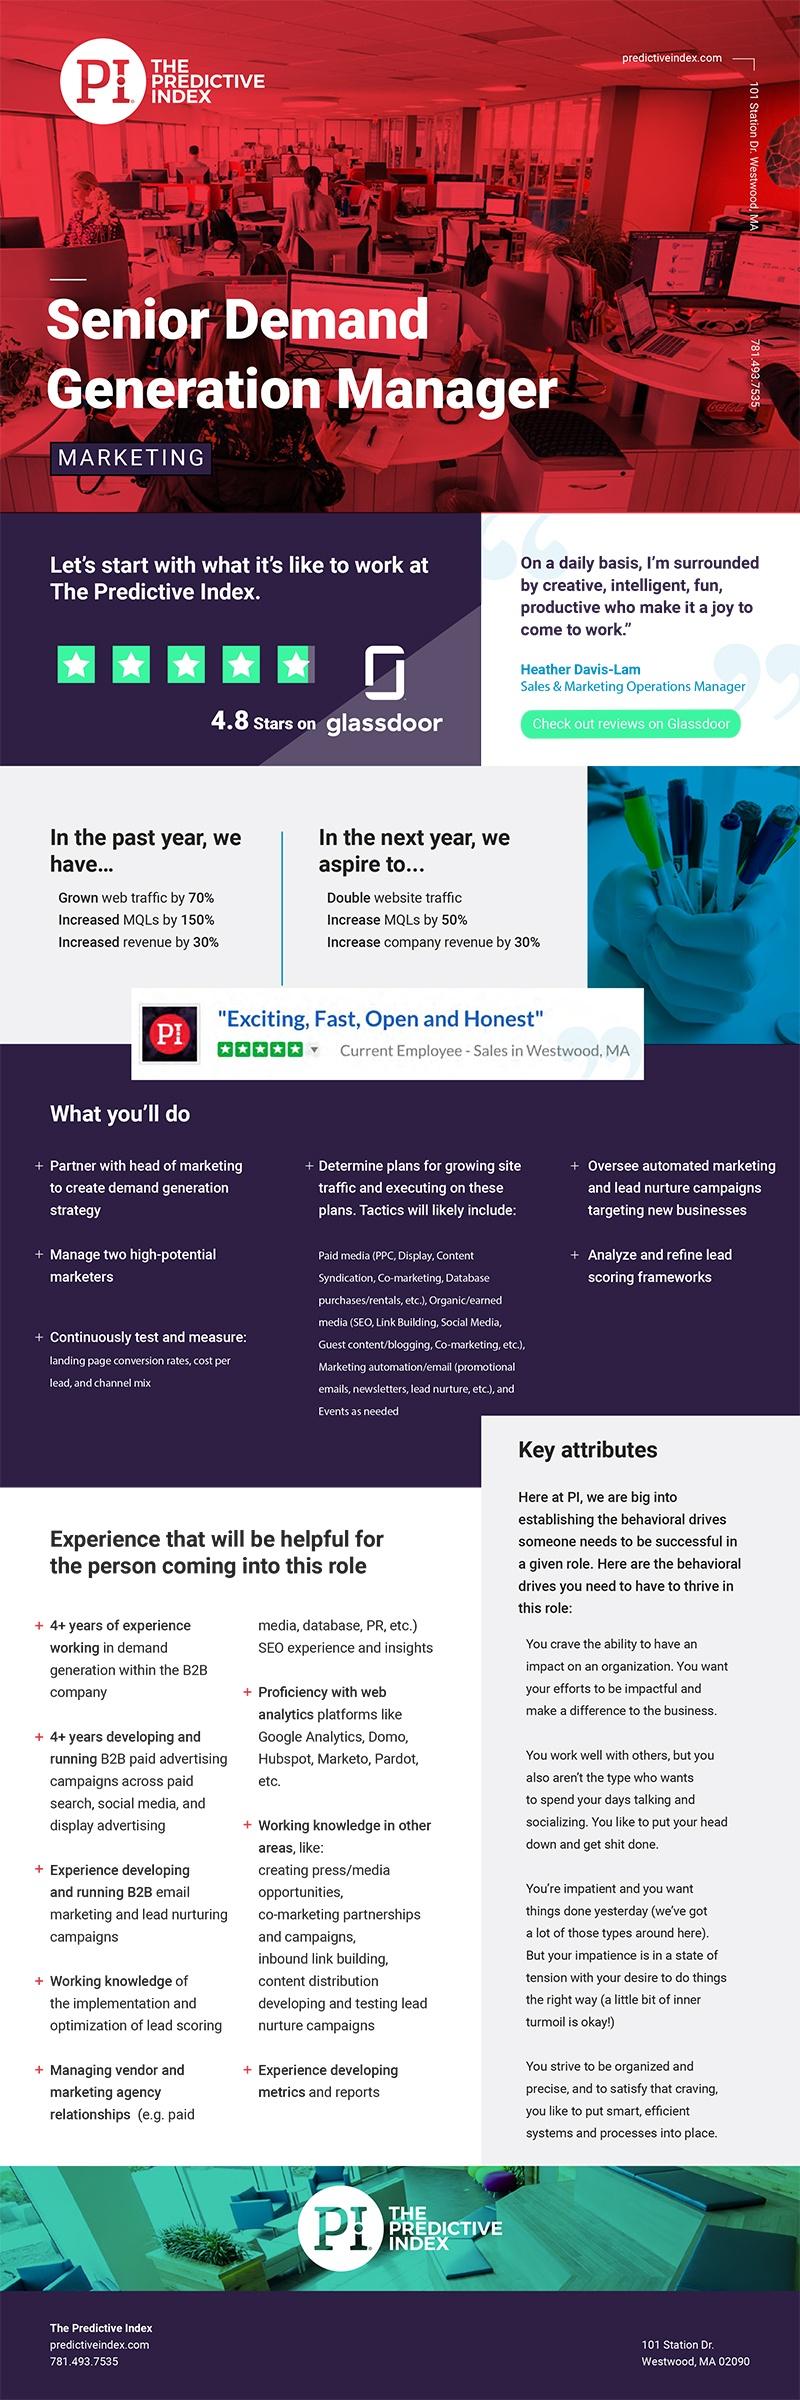 Senior Marketing Manager_Job Infographic-big.jpeg